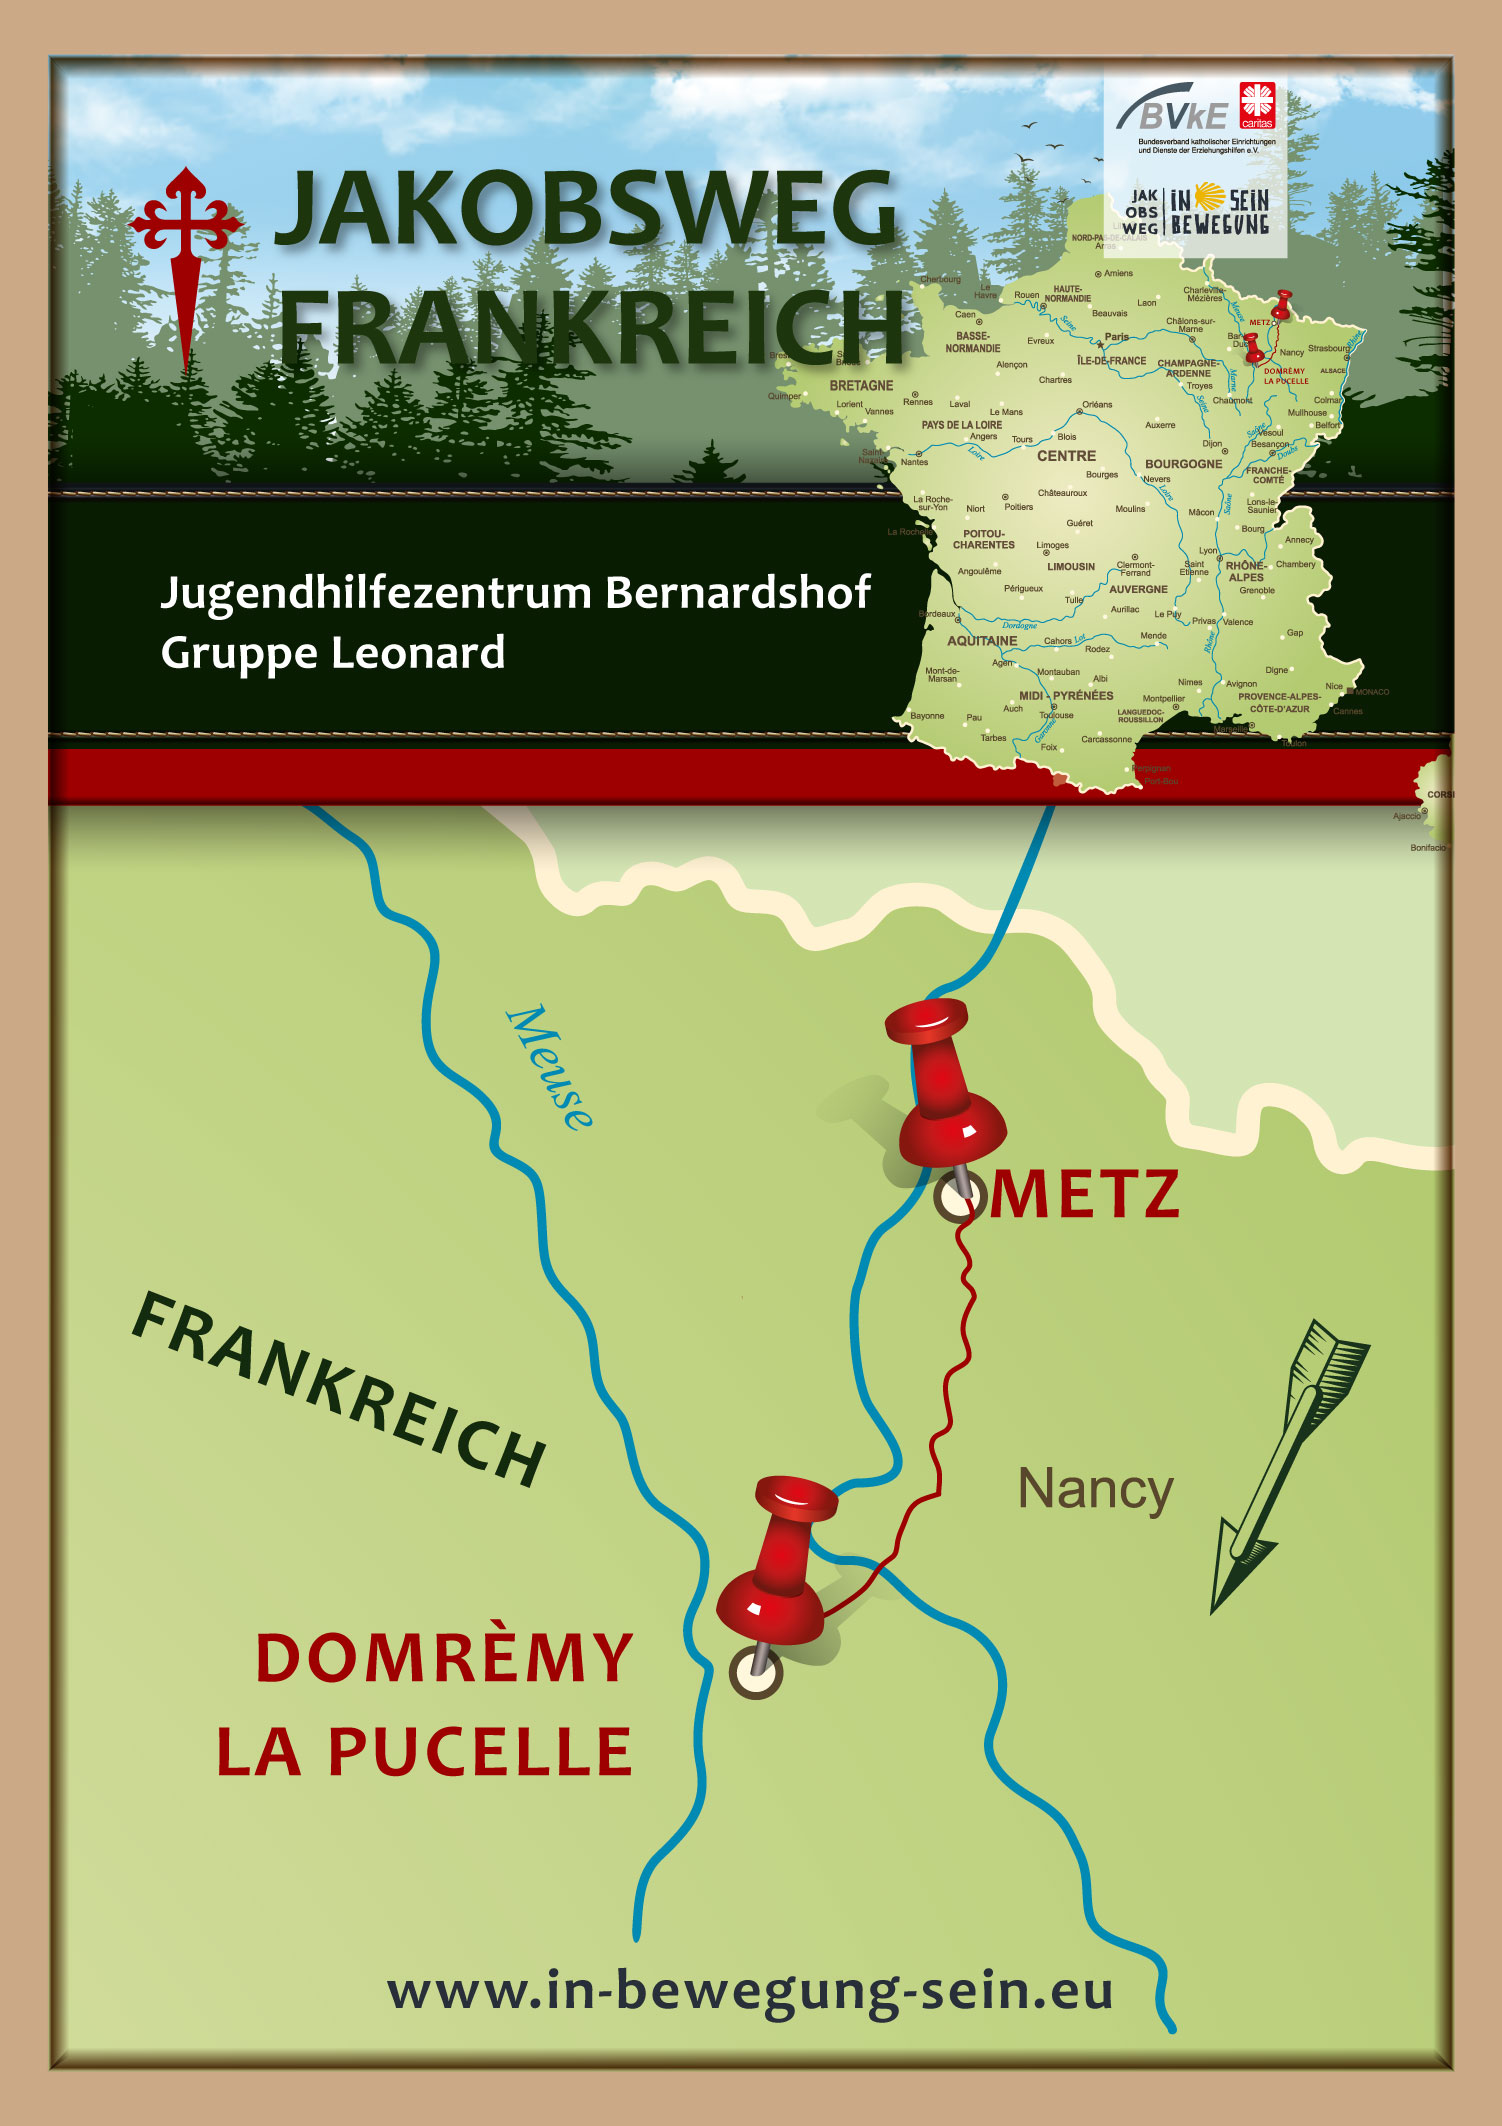 Posterkarte-Jugendhilfezentrum-Bernardshof-Gruppe-Leonard14-6-2018-Plakat